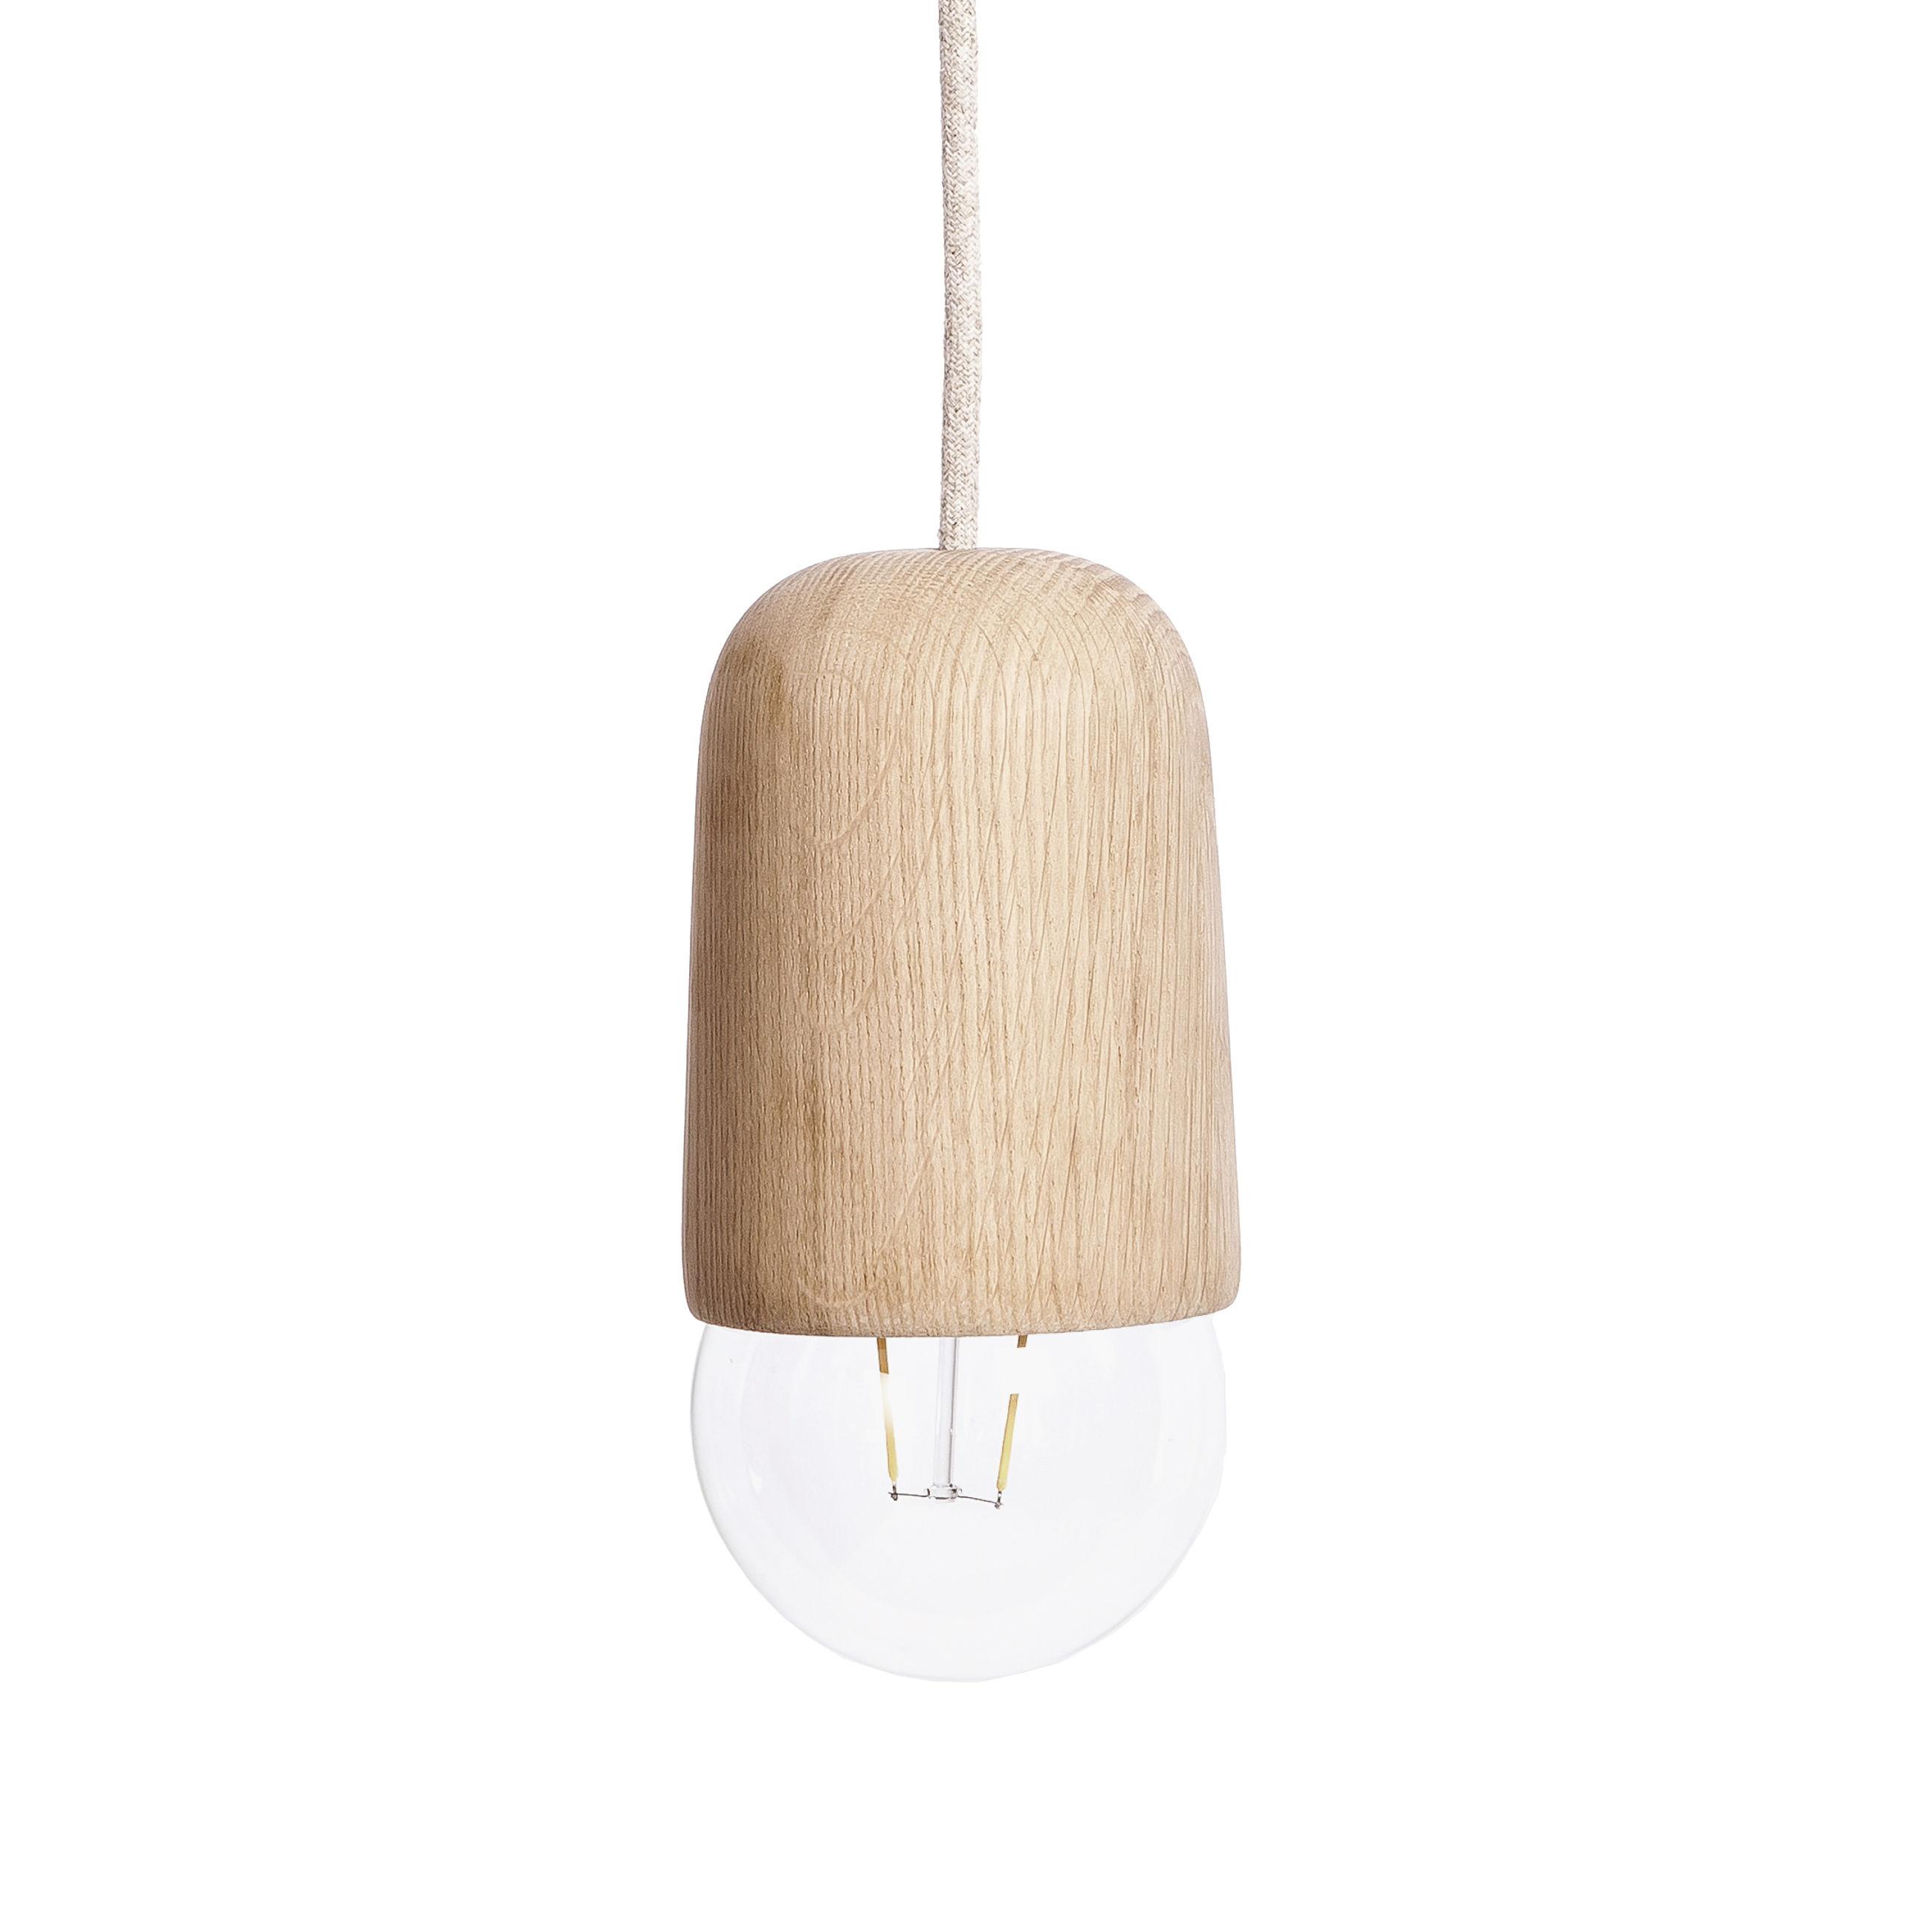 Lighting - Pendant Lighting - Luce Medium Pendant - Oak - LED - H 18 cm by Hartô - Natural oak / H 18 cm - Solid oak